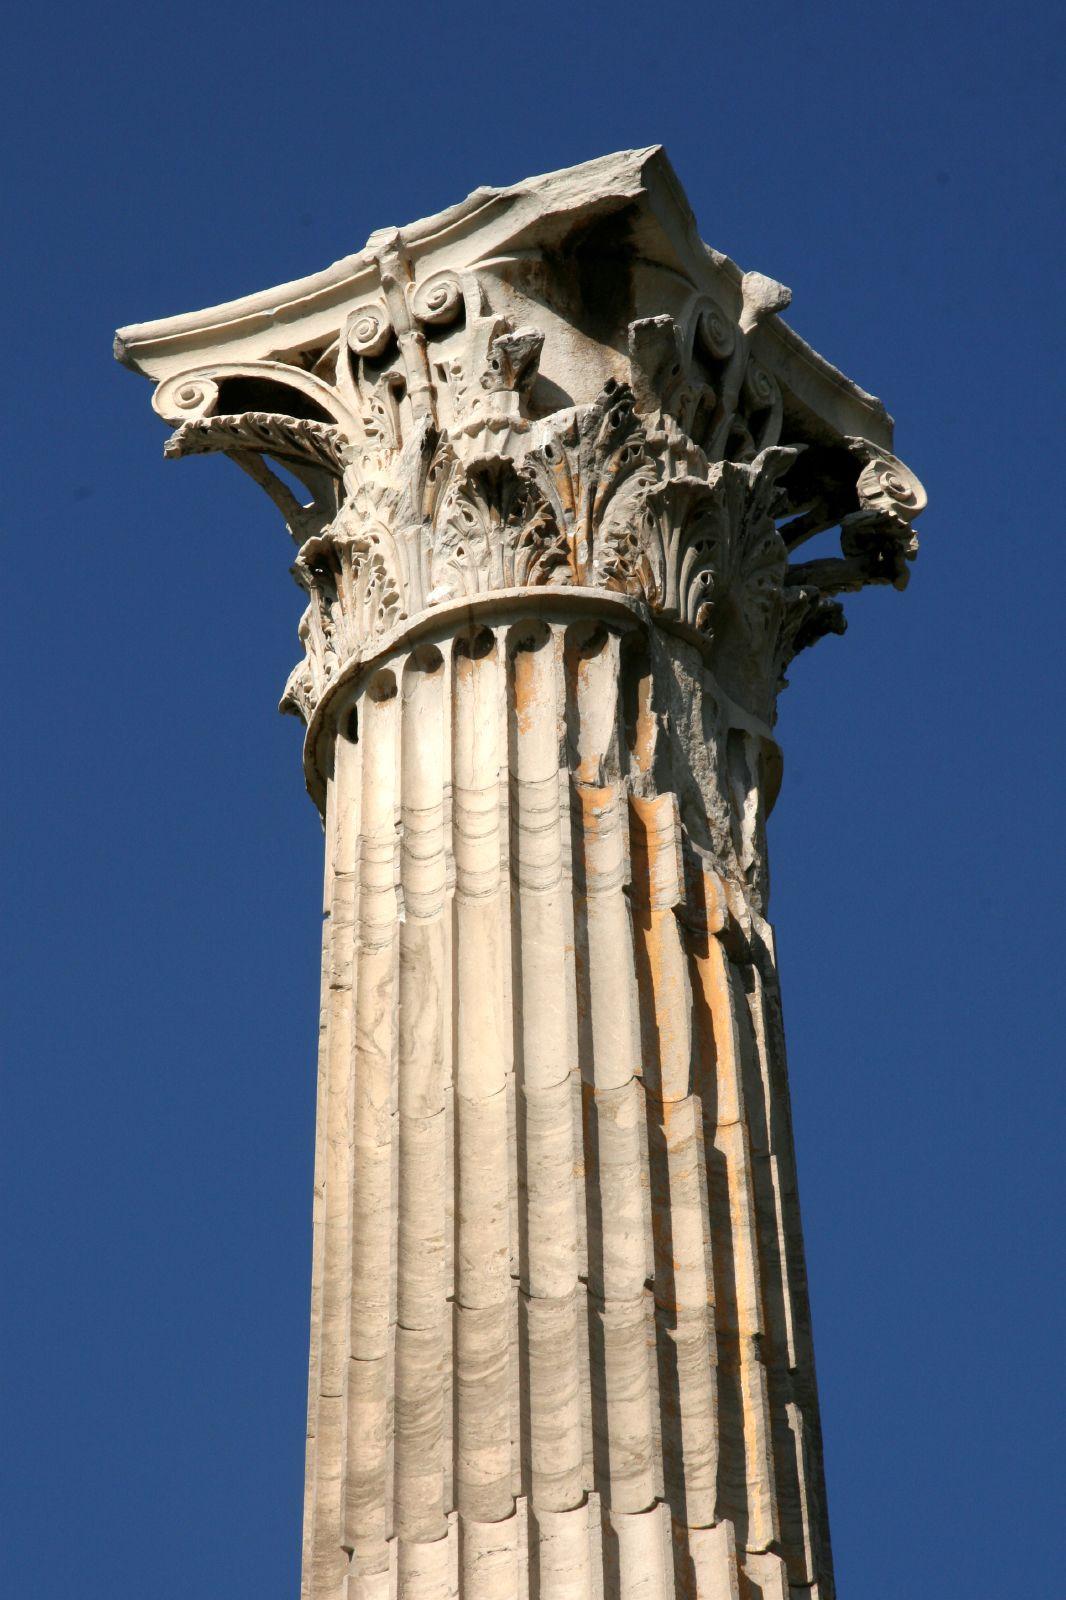 Pillars And Columns : The great historical greek architecture corinthian columns